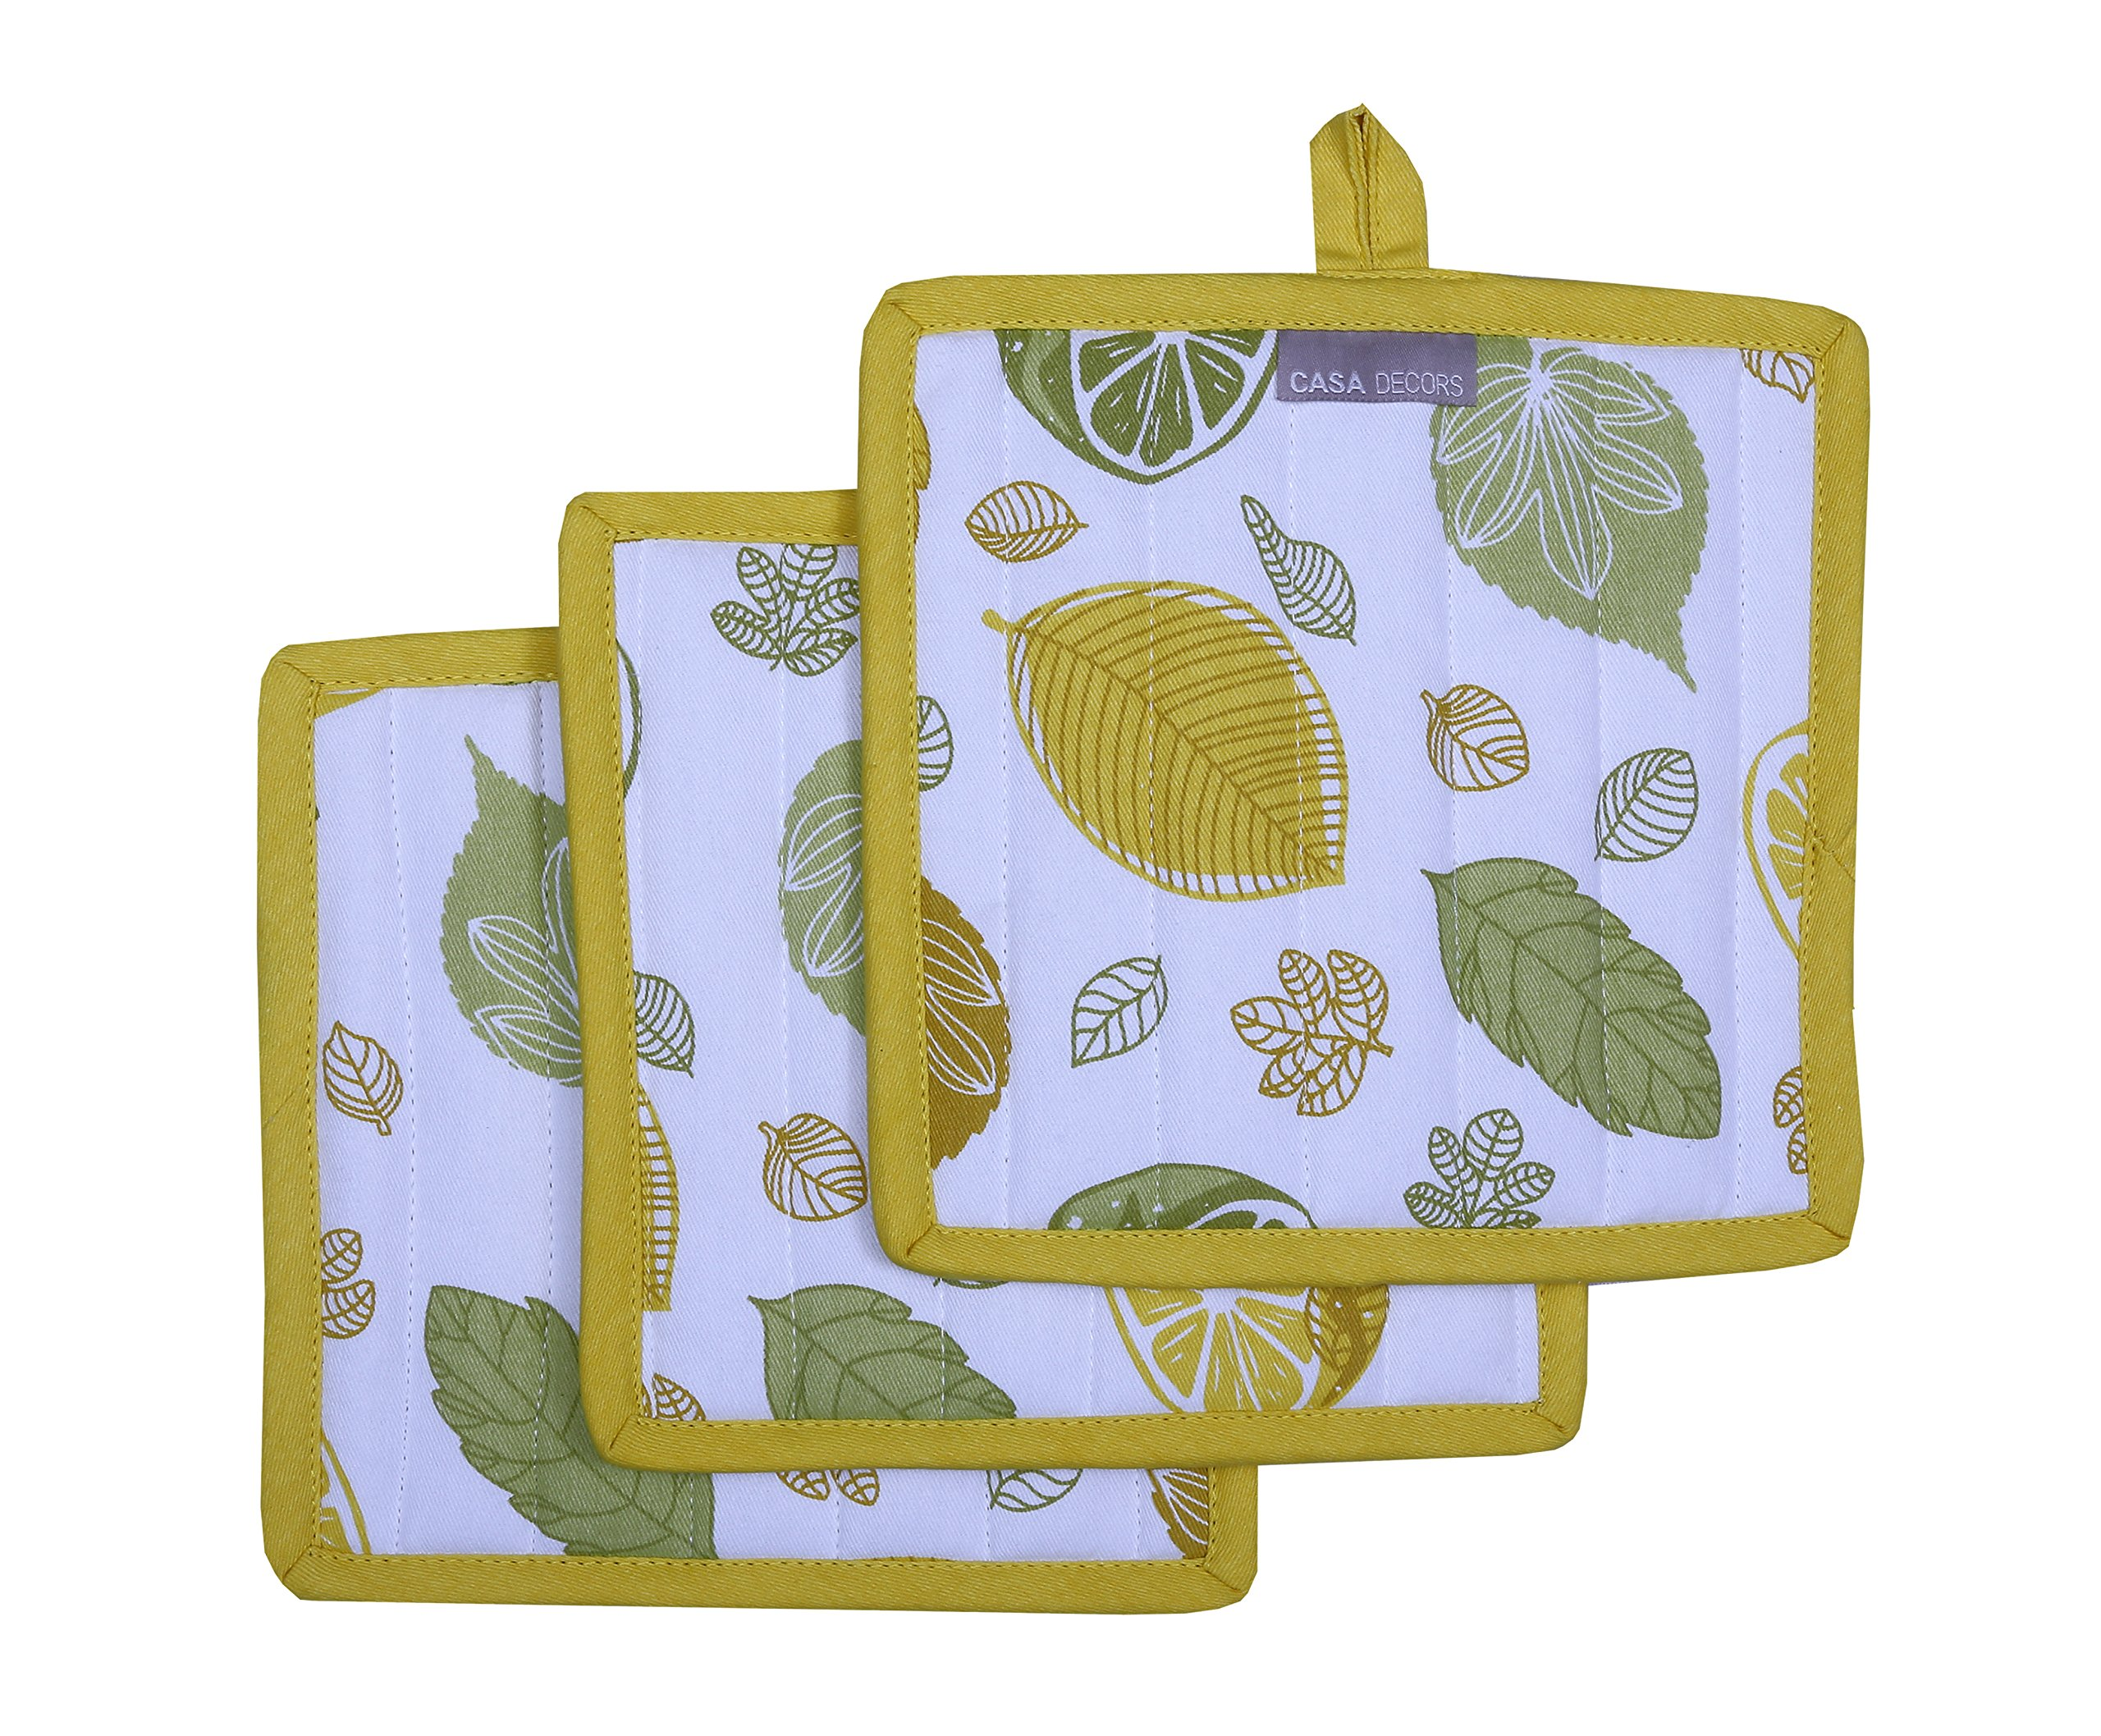 Pot Holders, Unique Citrus Splash Design, Pot Holders Heat Resistant, Made of 100% Cotton, Eco-Friendly & Safe, Set of 3, Pot Holder size 8 x 8 inches, Pot Holders for Kitchen By CASA DECORS